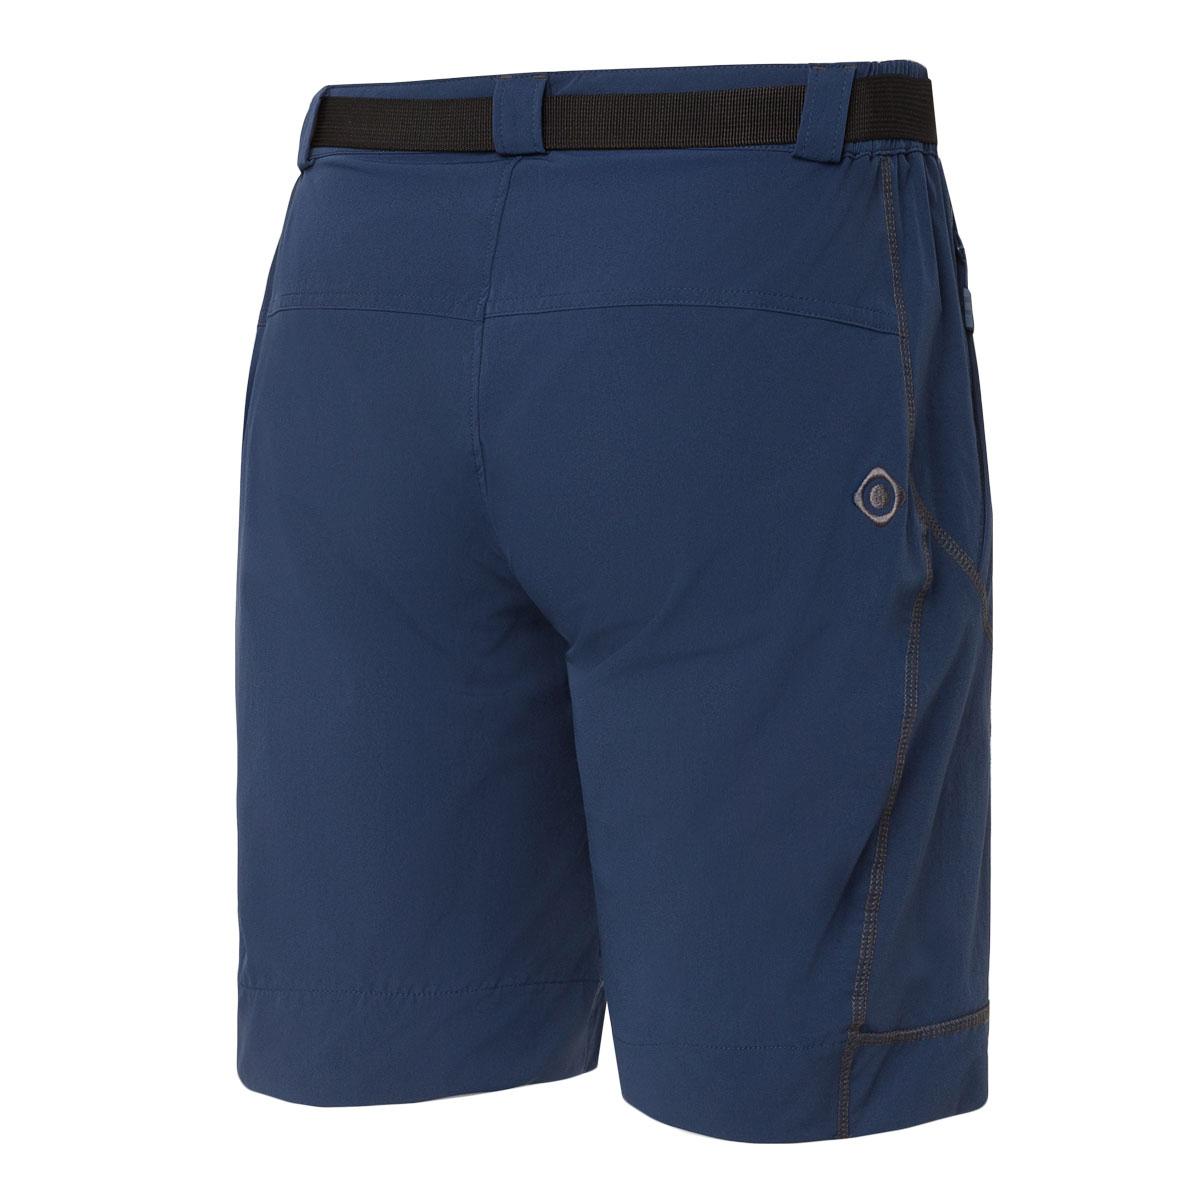 MAN'S FRISEL STRETCH SHORT PANT BLUE